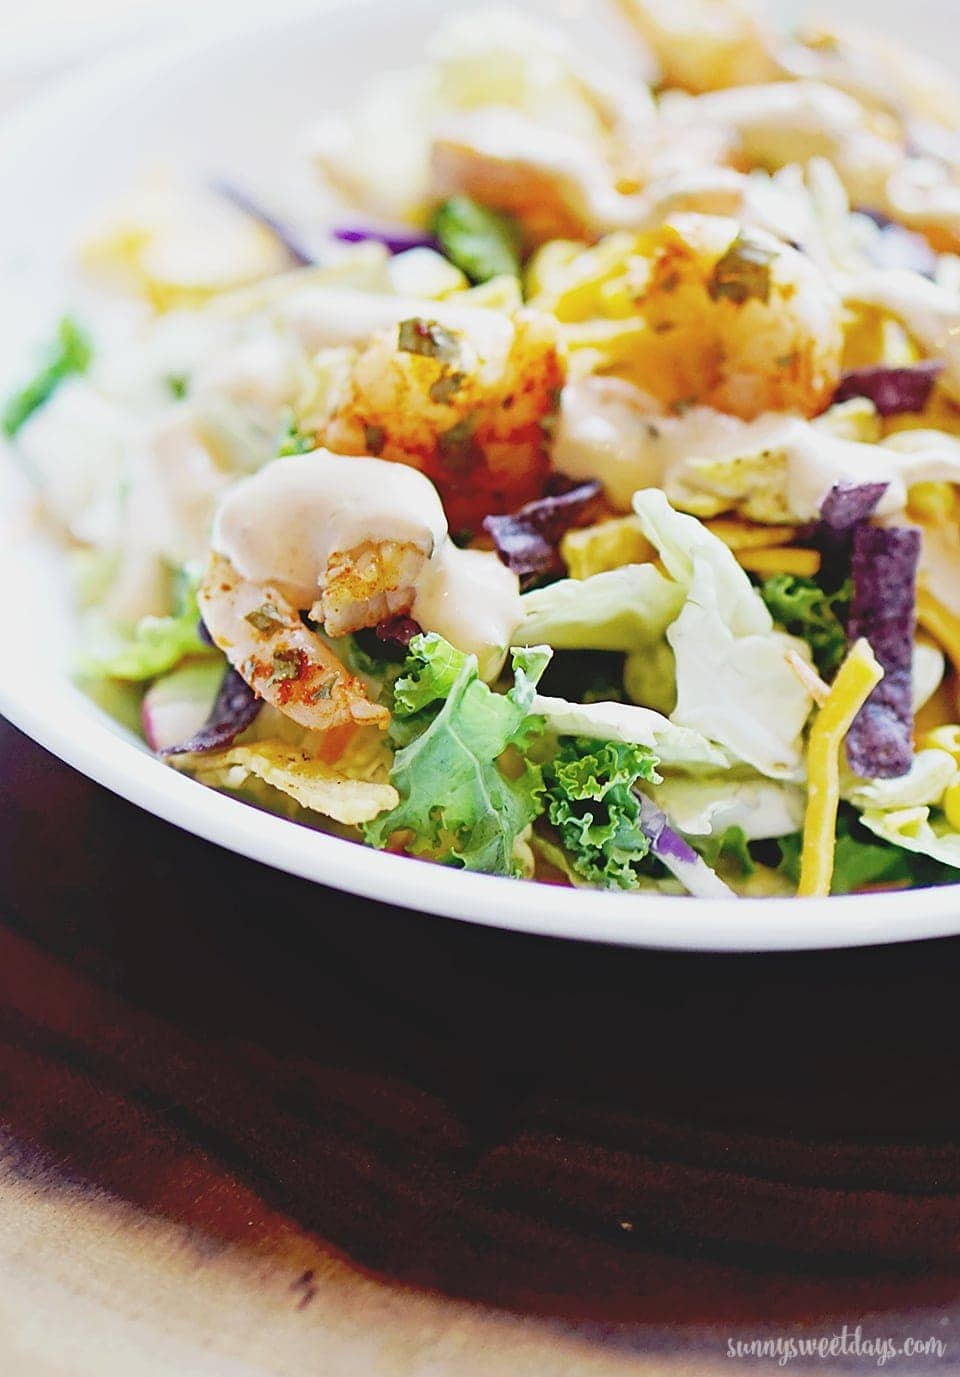 Southwestern Kale Shrimp Salad